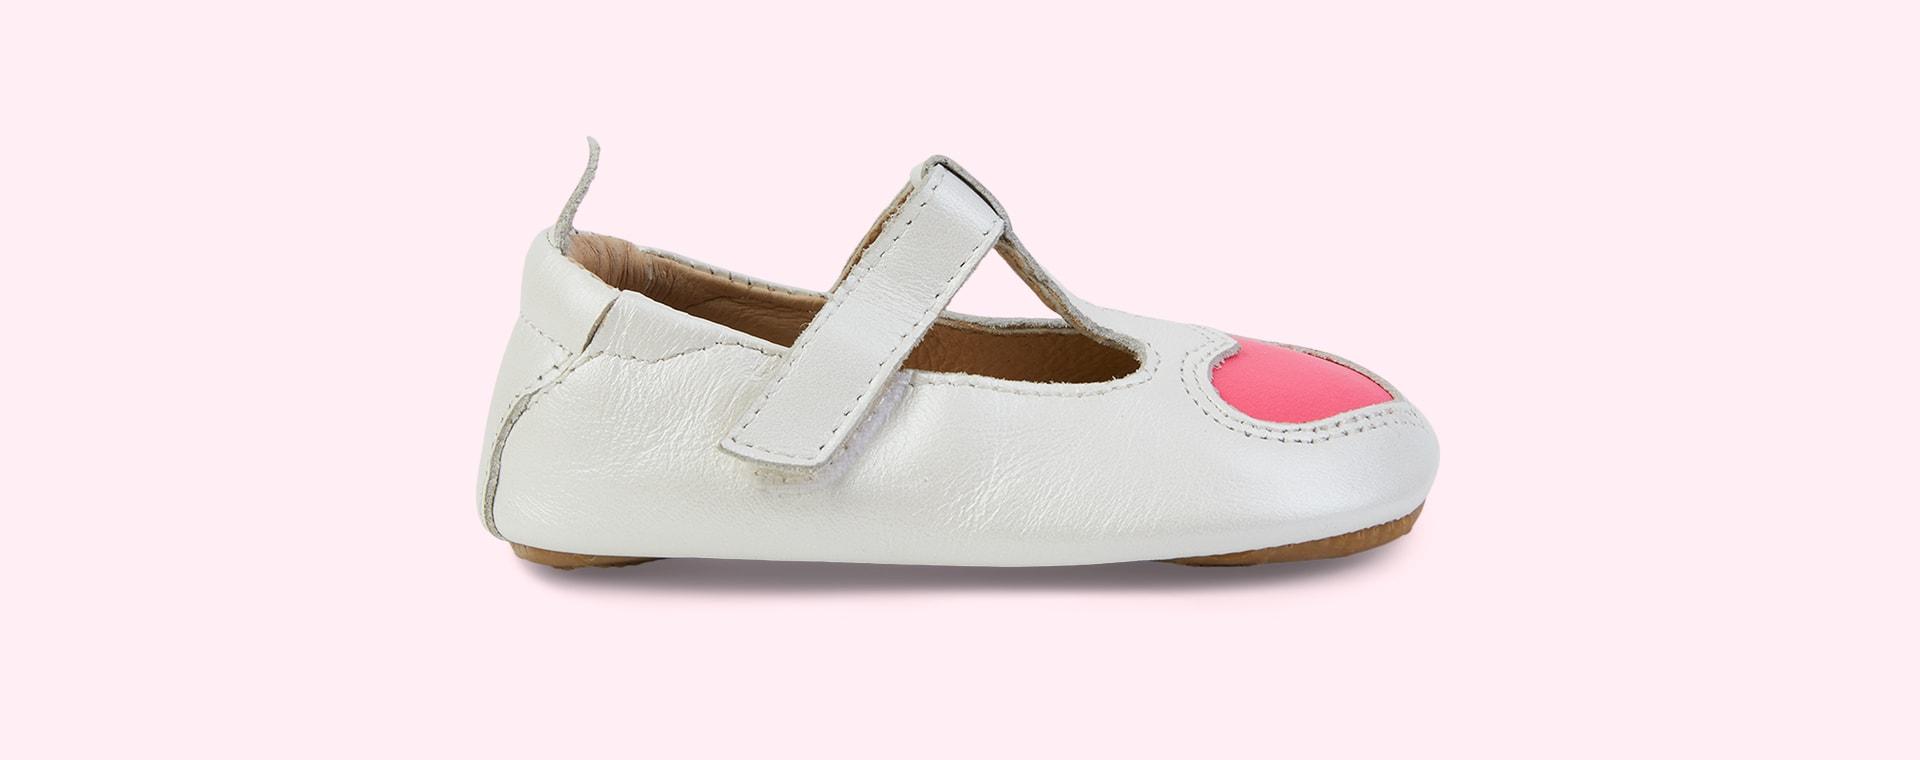 Nacardo Blanco/Neon Pink old soles Ohme-Heart